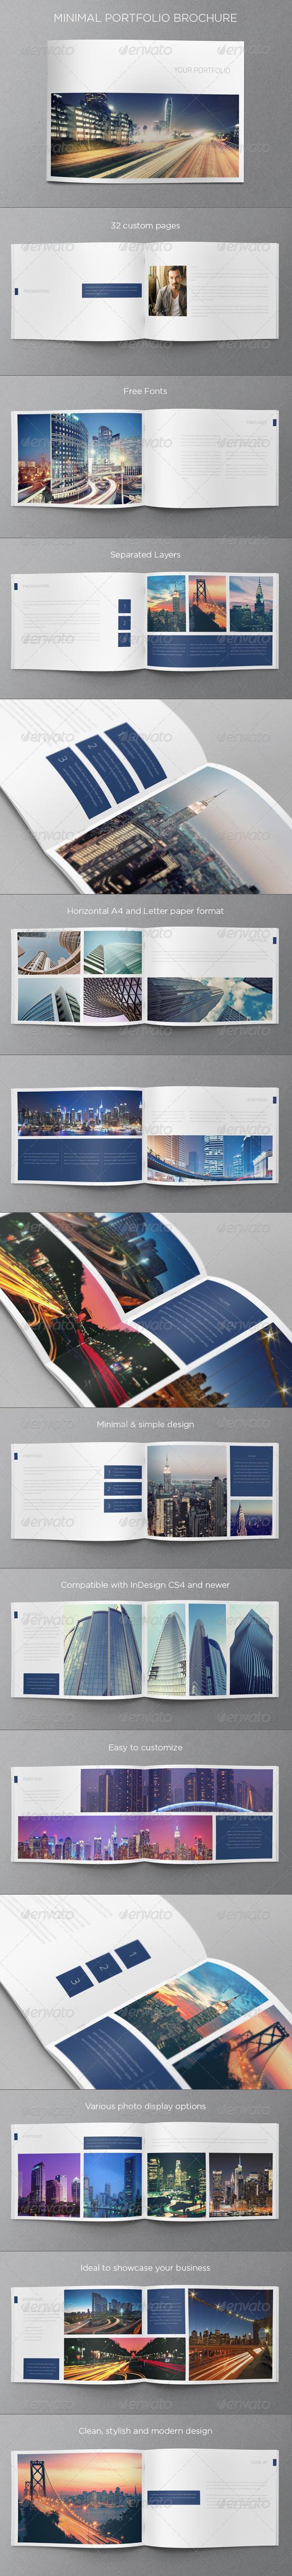 GraphicRiver Minimal Portfolio Brochure 5291229